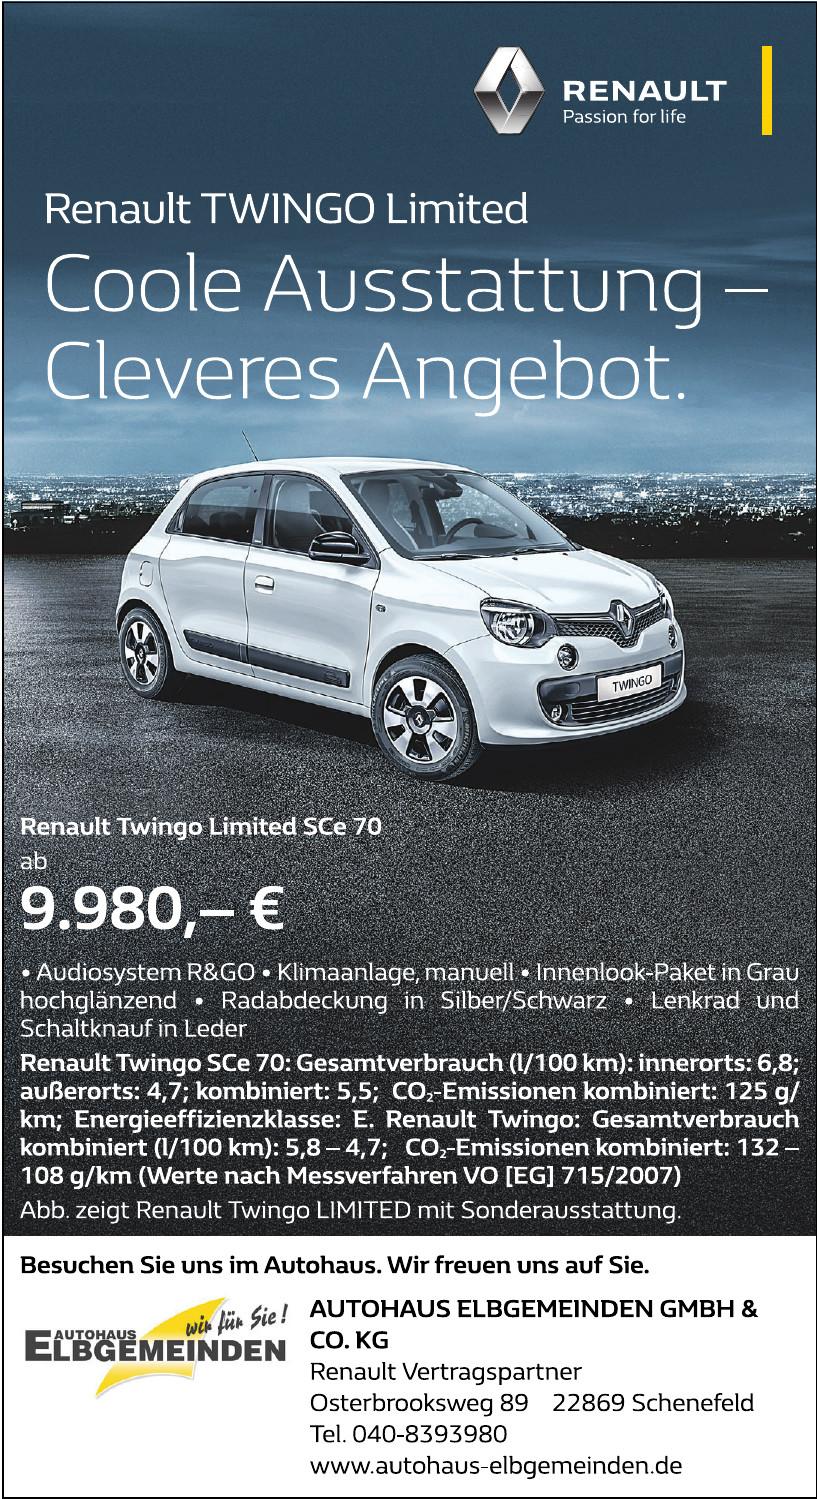 Autohaus Elbgemenden GmbH & Co.KG